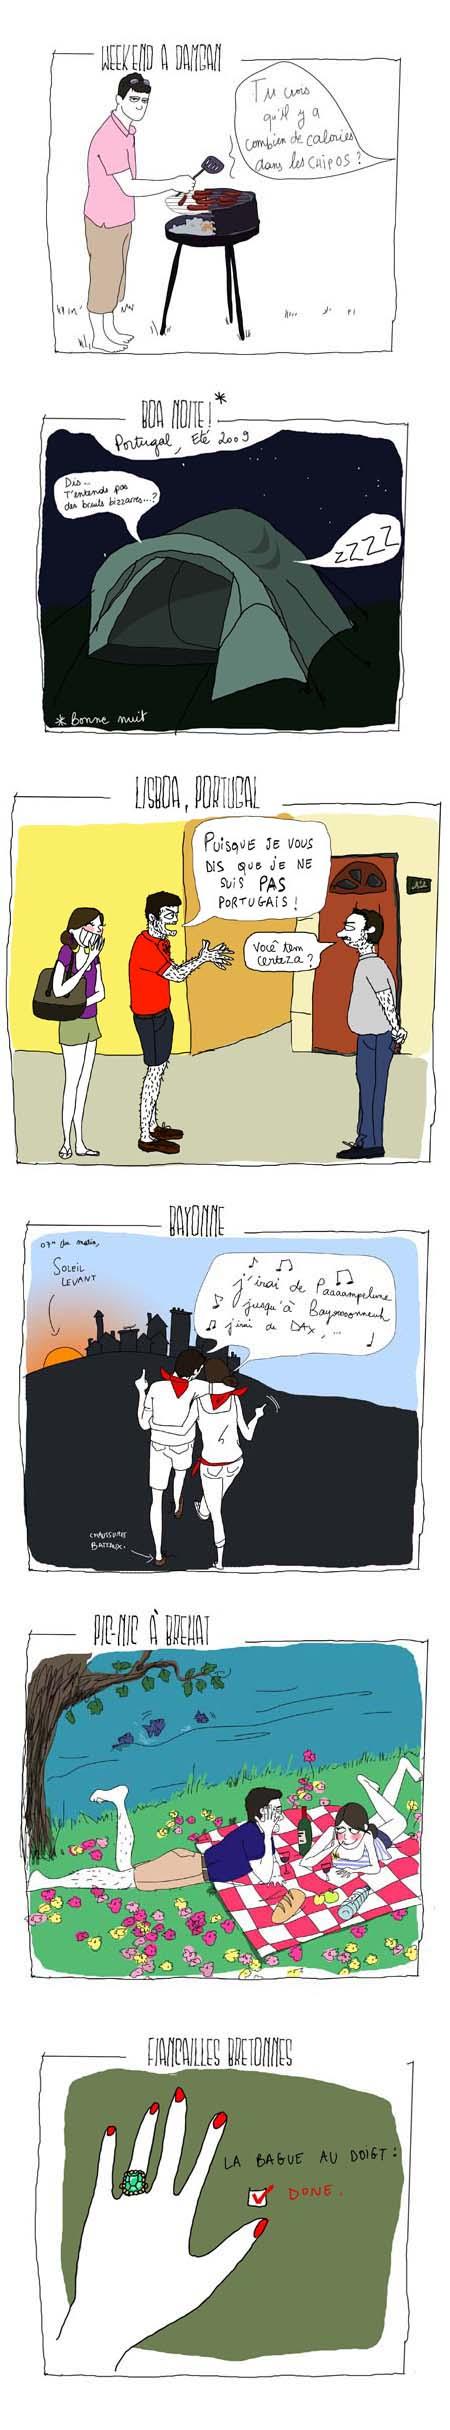 Illustration mariage1